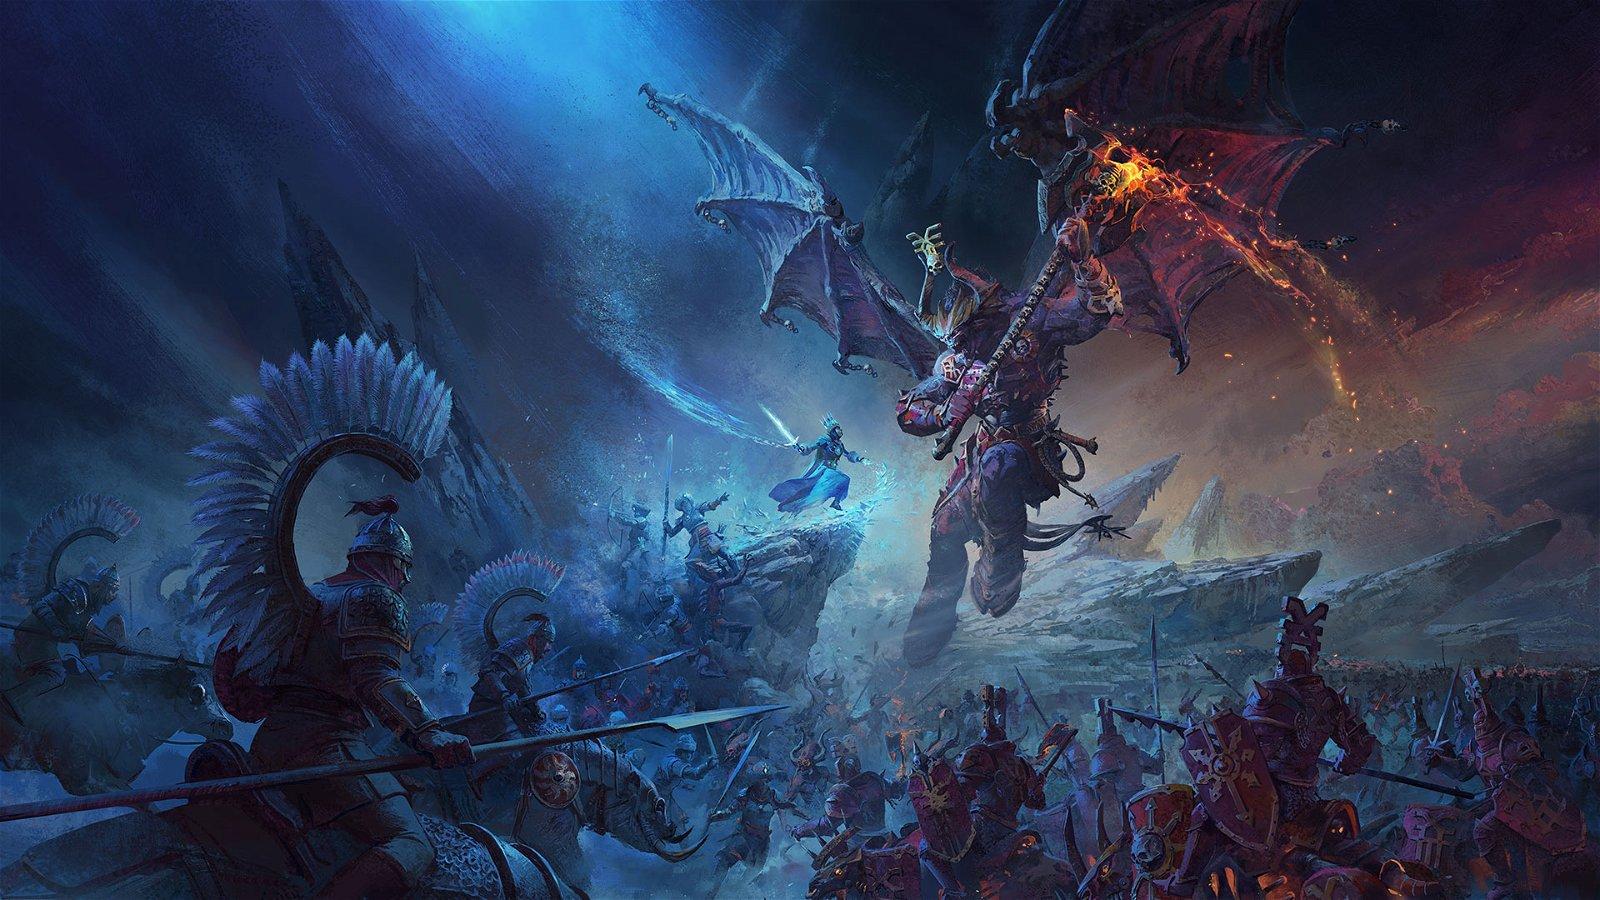 Total War: Warhammer III Preview